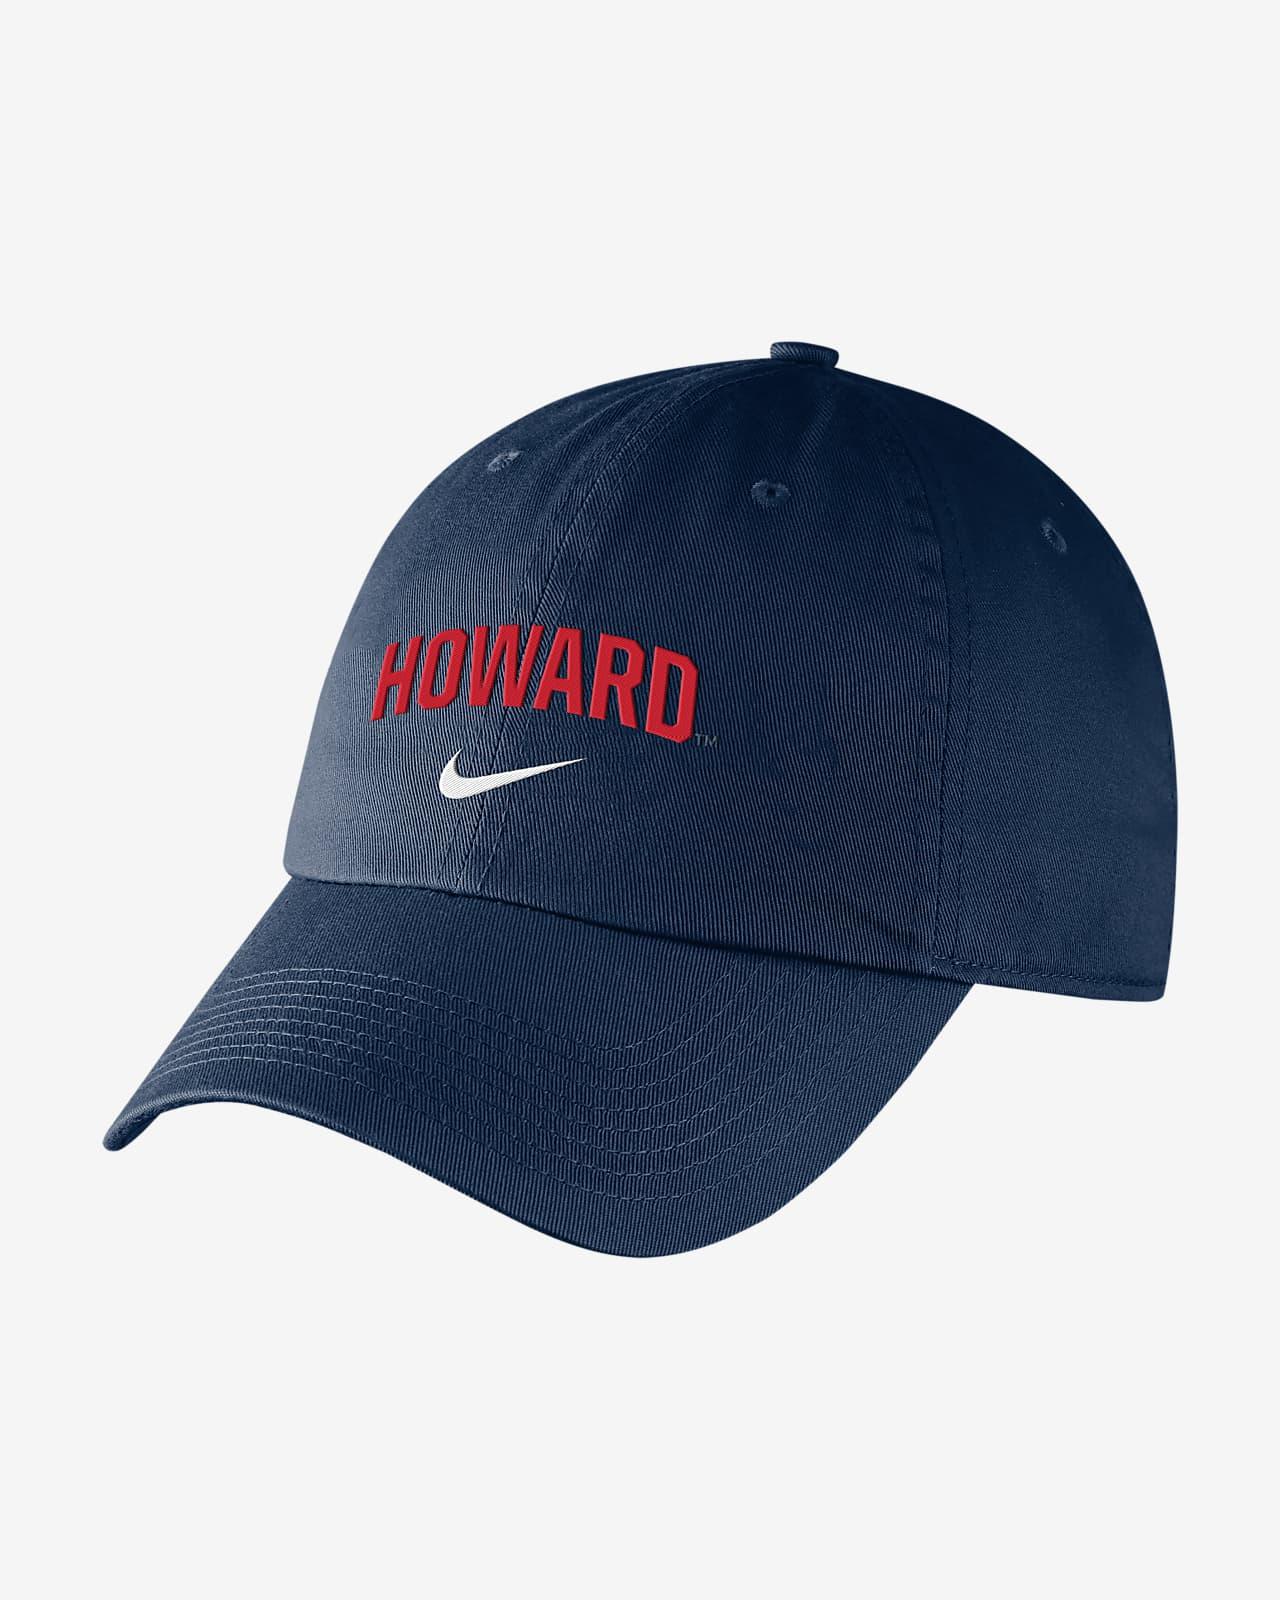 Nike College (Howard) Hat